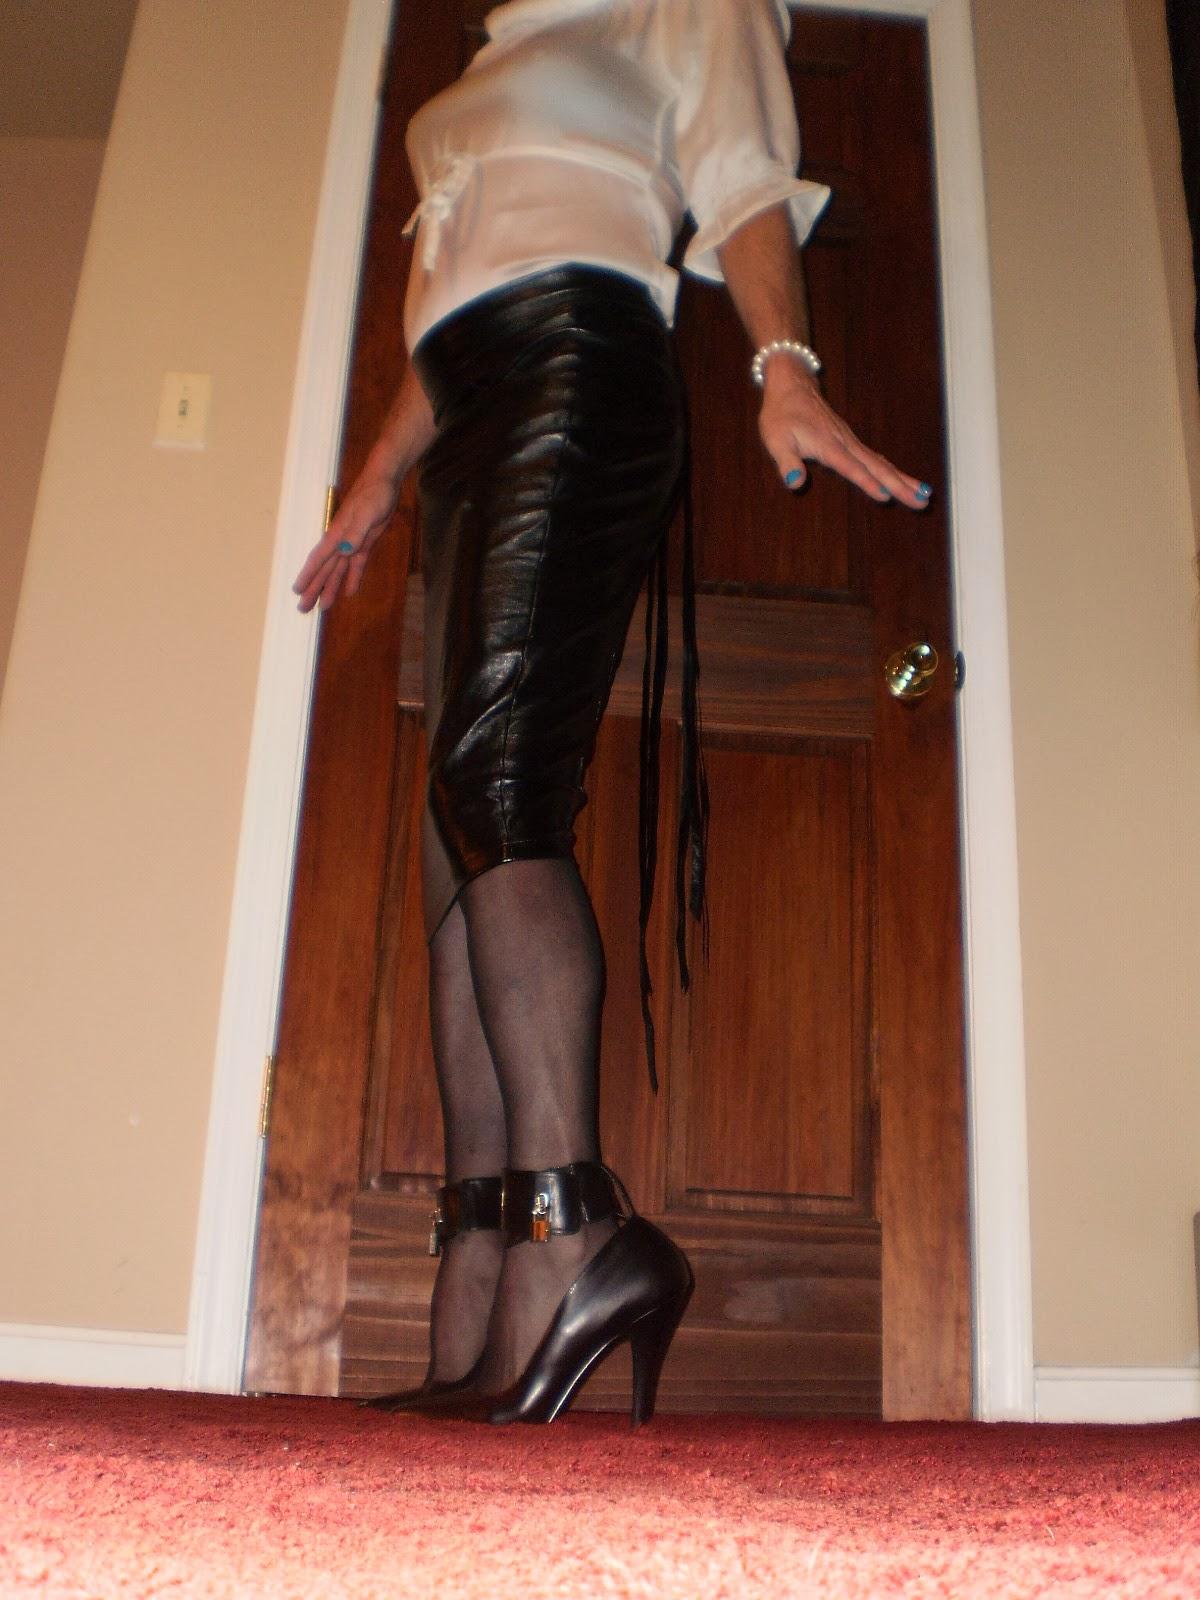 latex hobble skirt blowjob